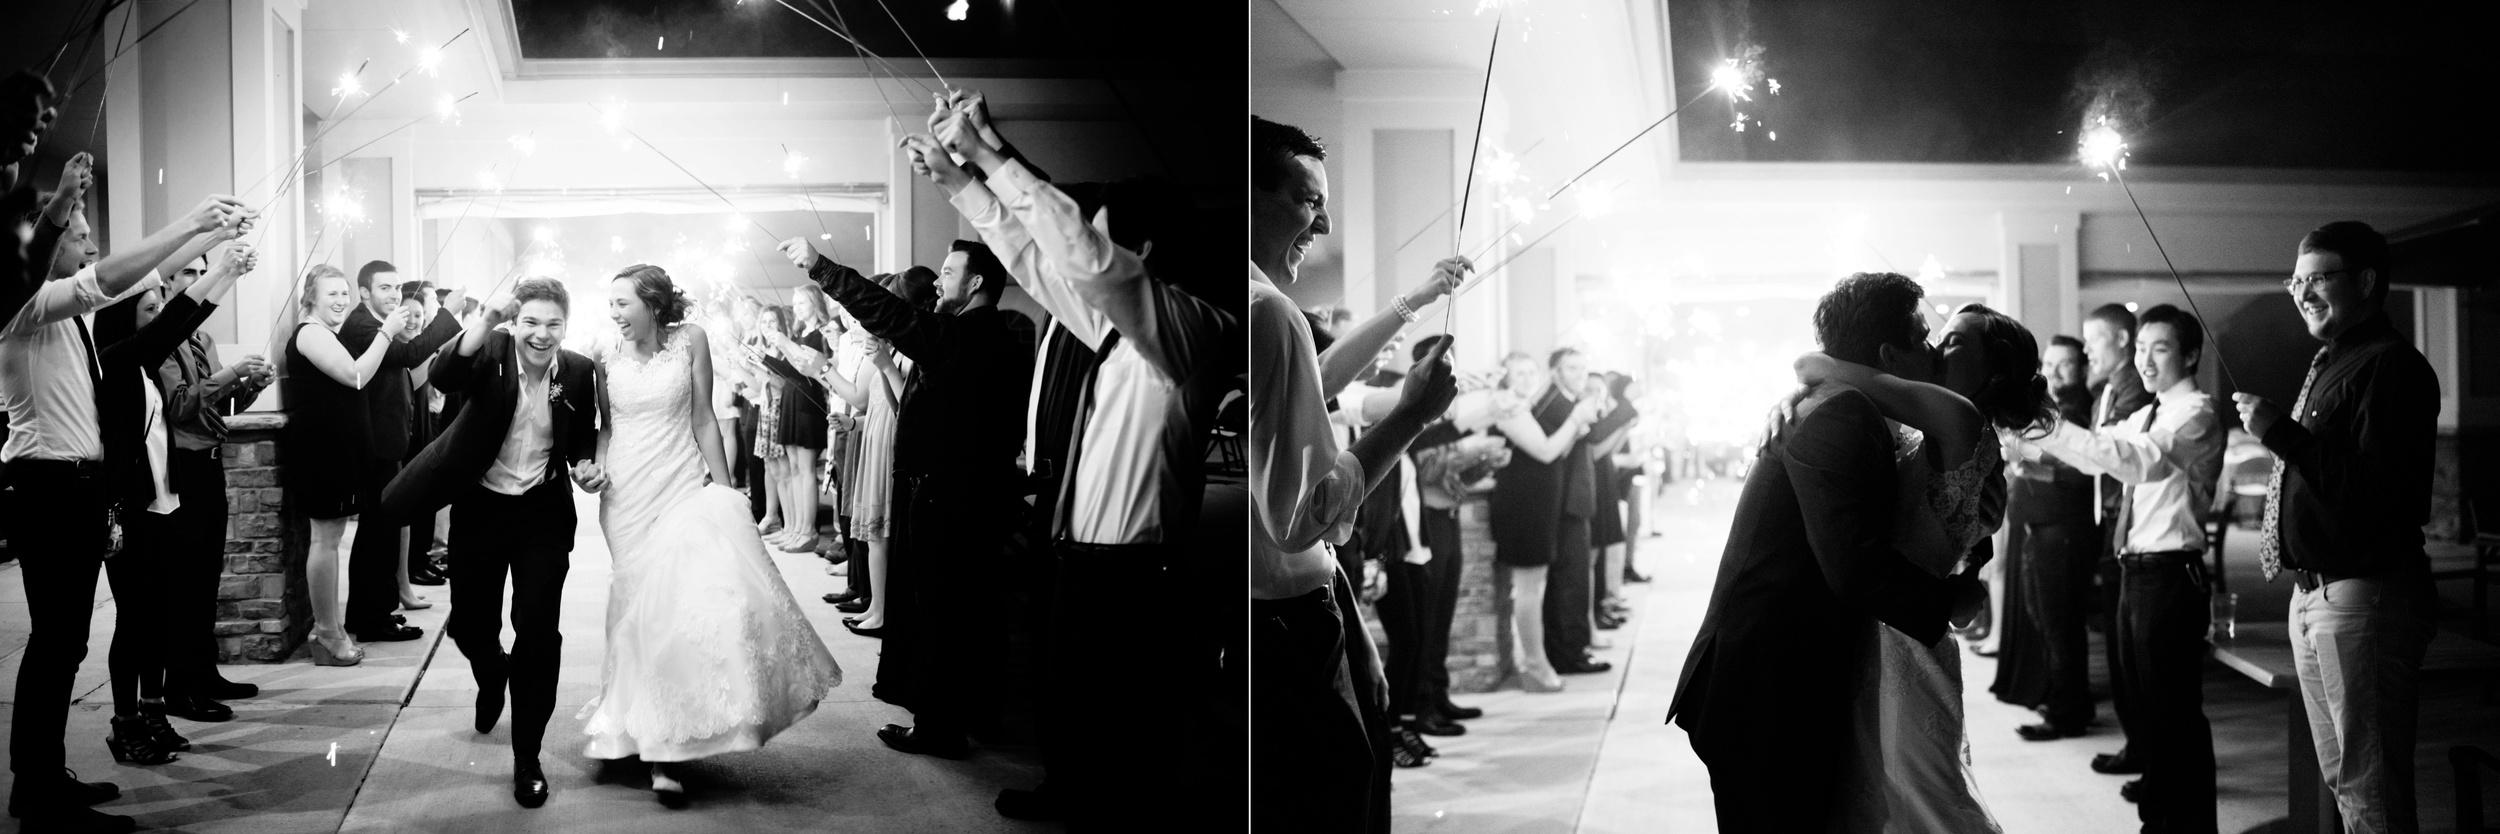 Pleasant Hill Des Moines Wedding Photographer_2214.jpg